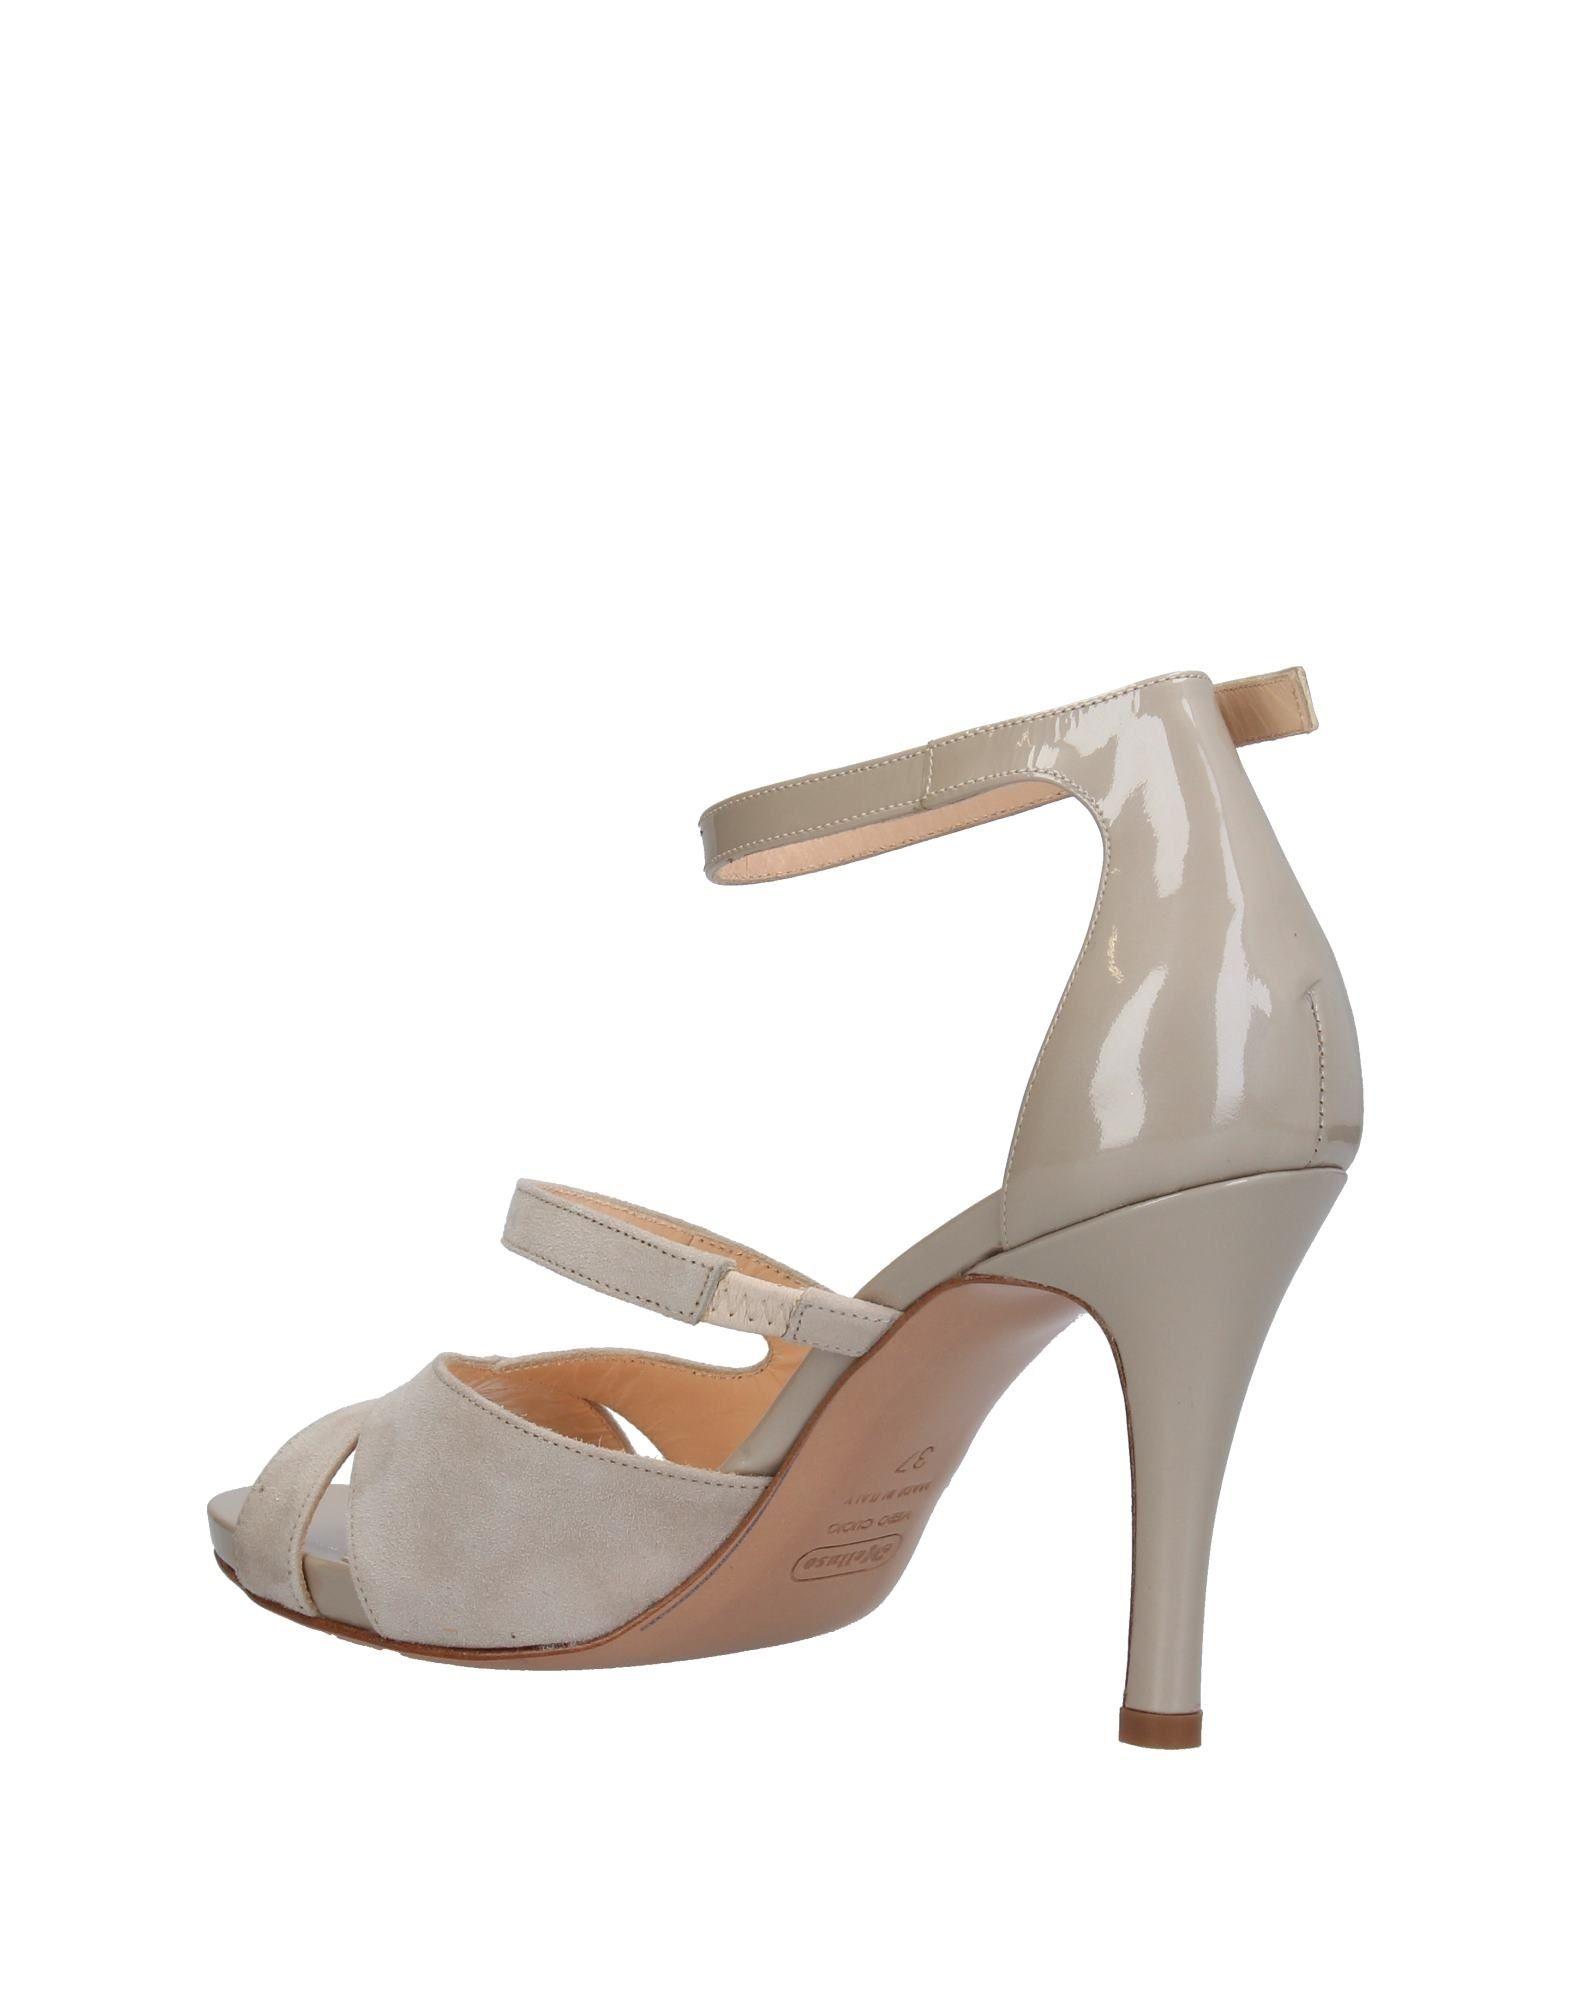 Moda Sandali Melluso Donna - - - 11372665WP 9a5b58